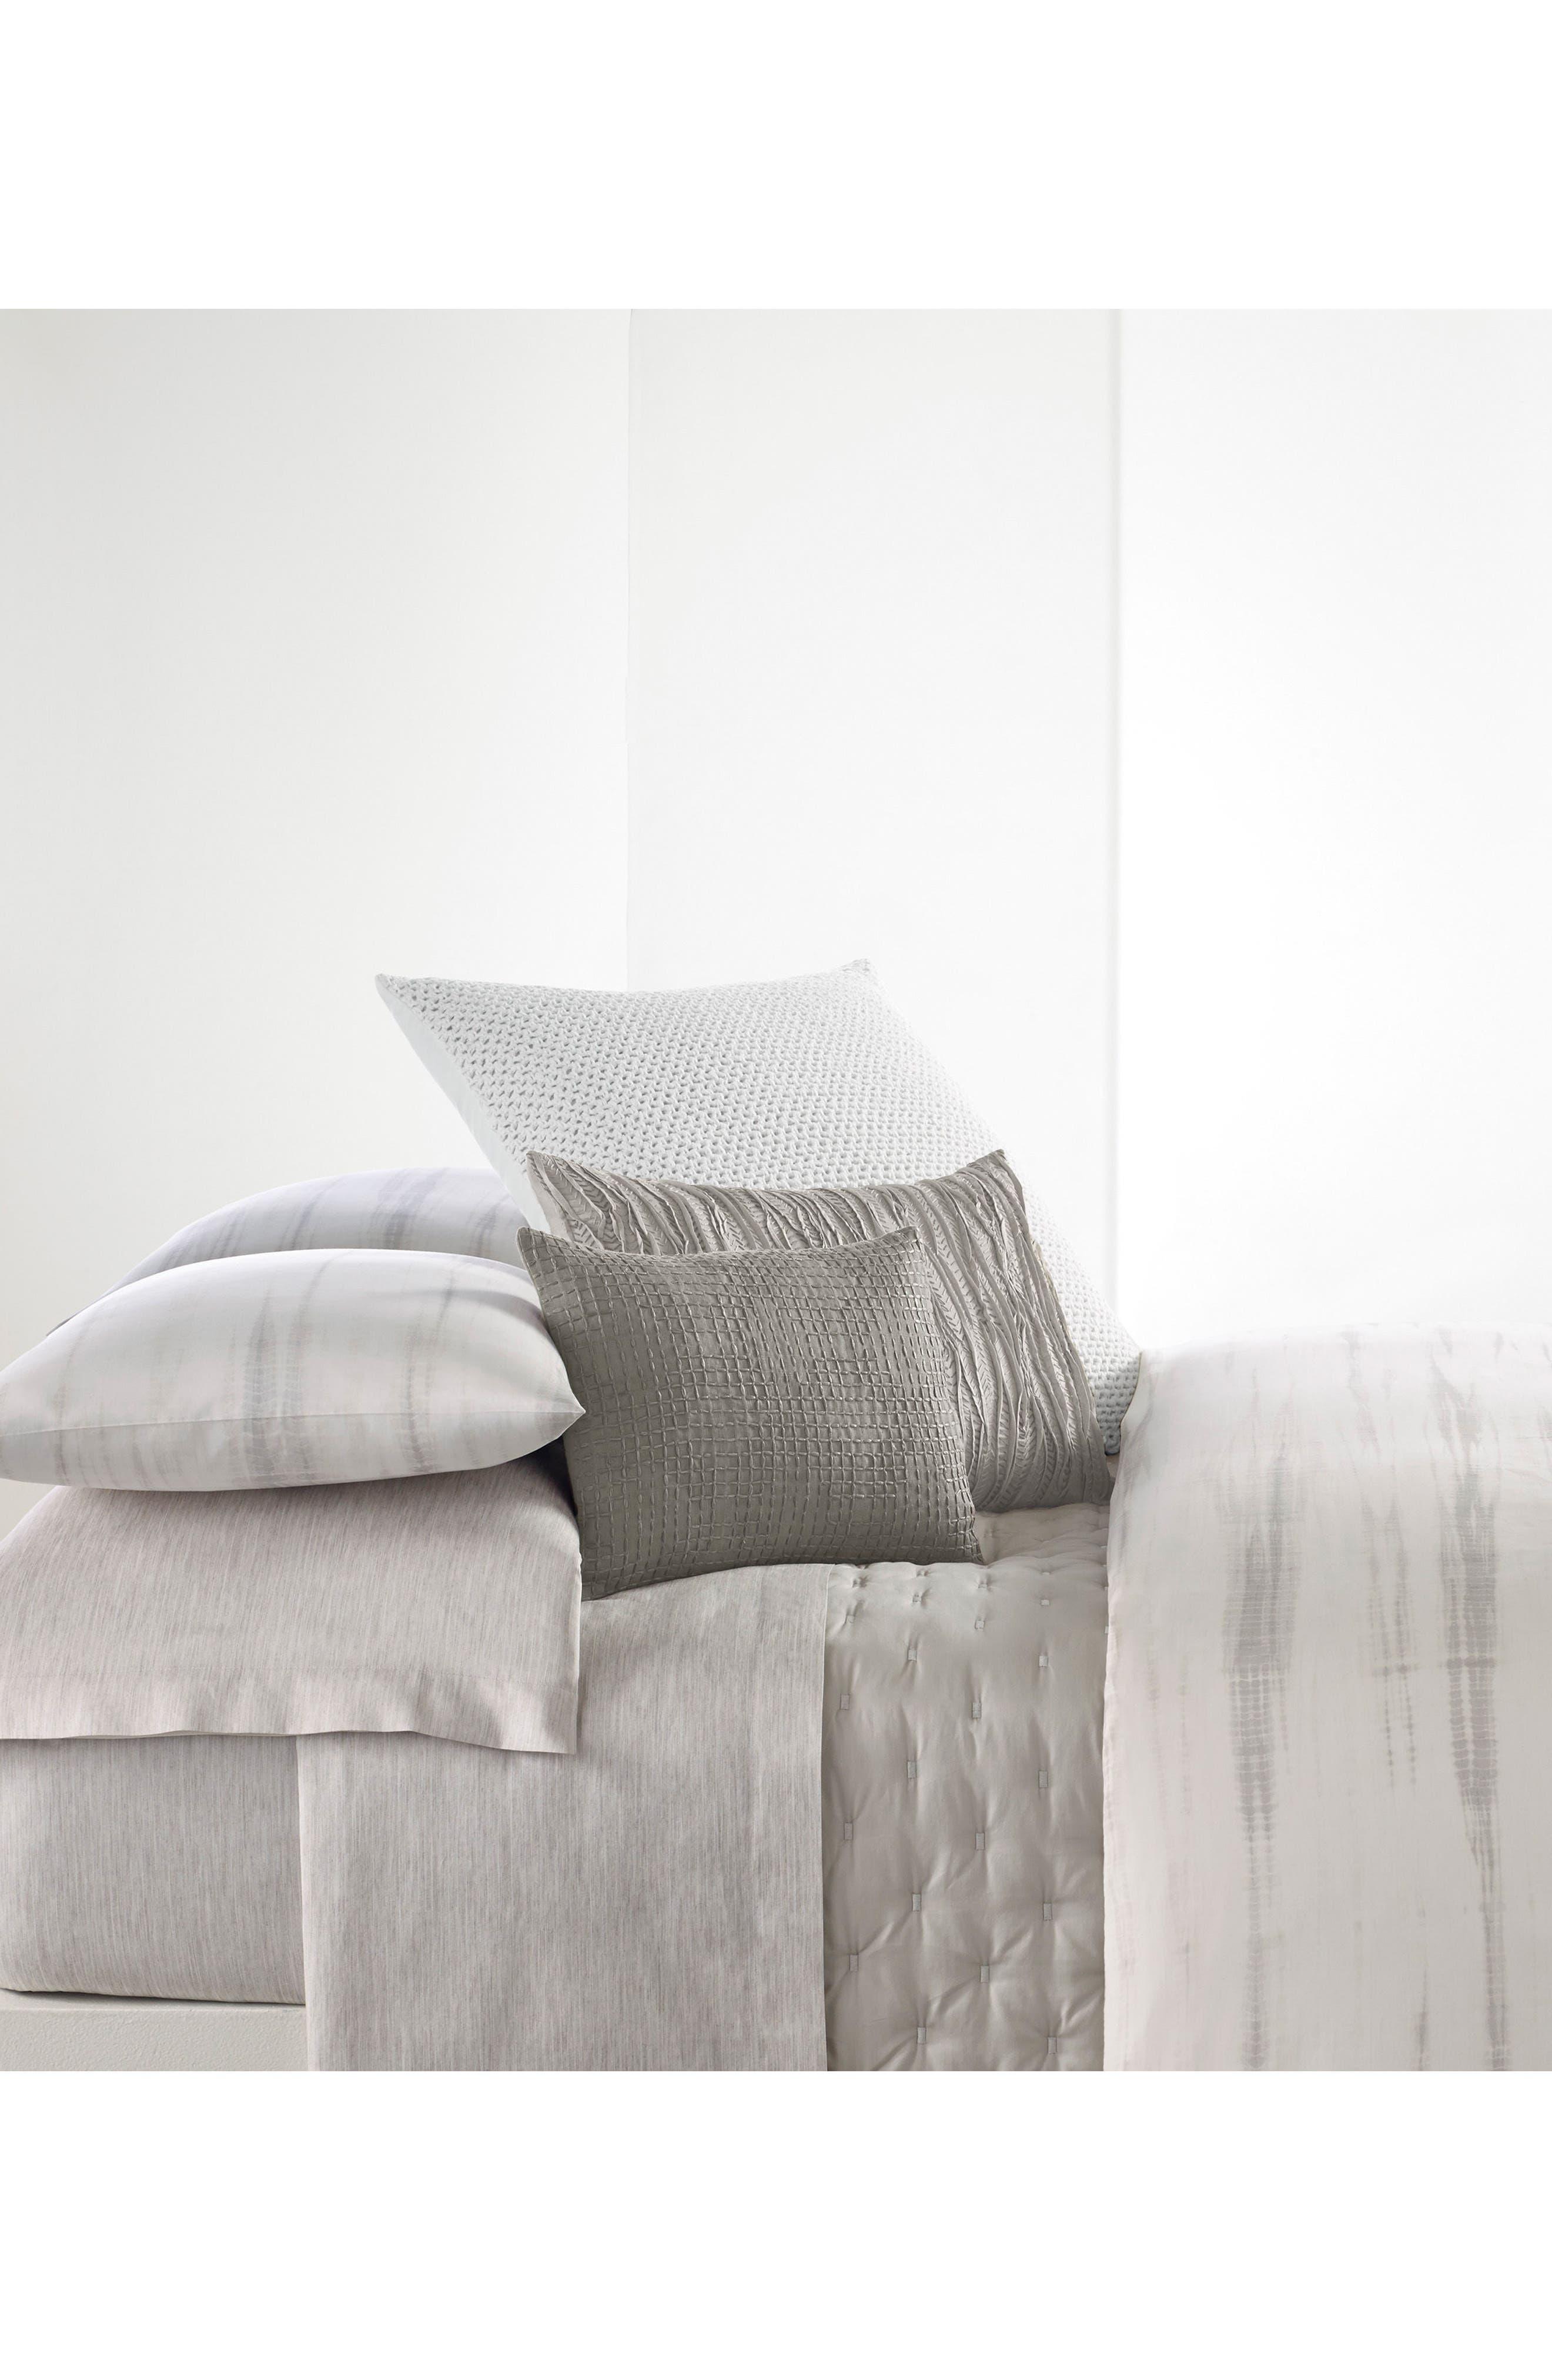 Alternate Image 1 Selected - Vera Wang Marble Shibori 350 Thread Count Duvet Cover